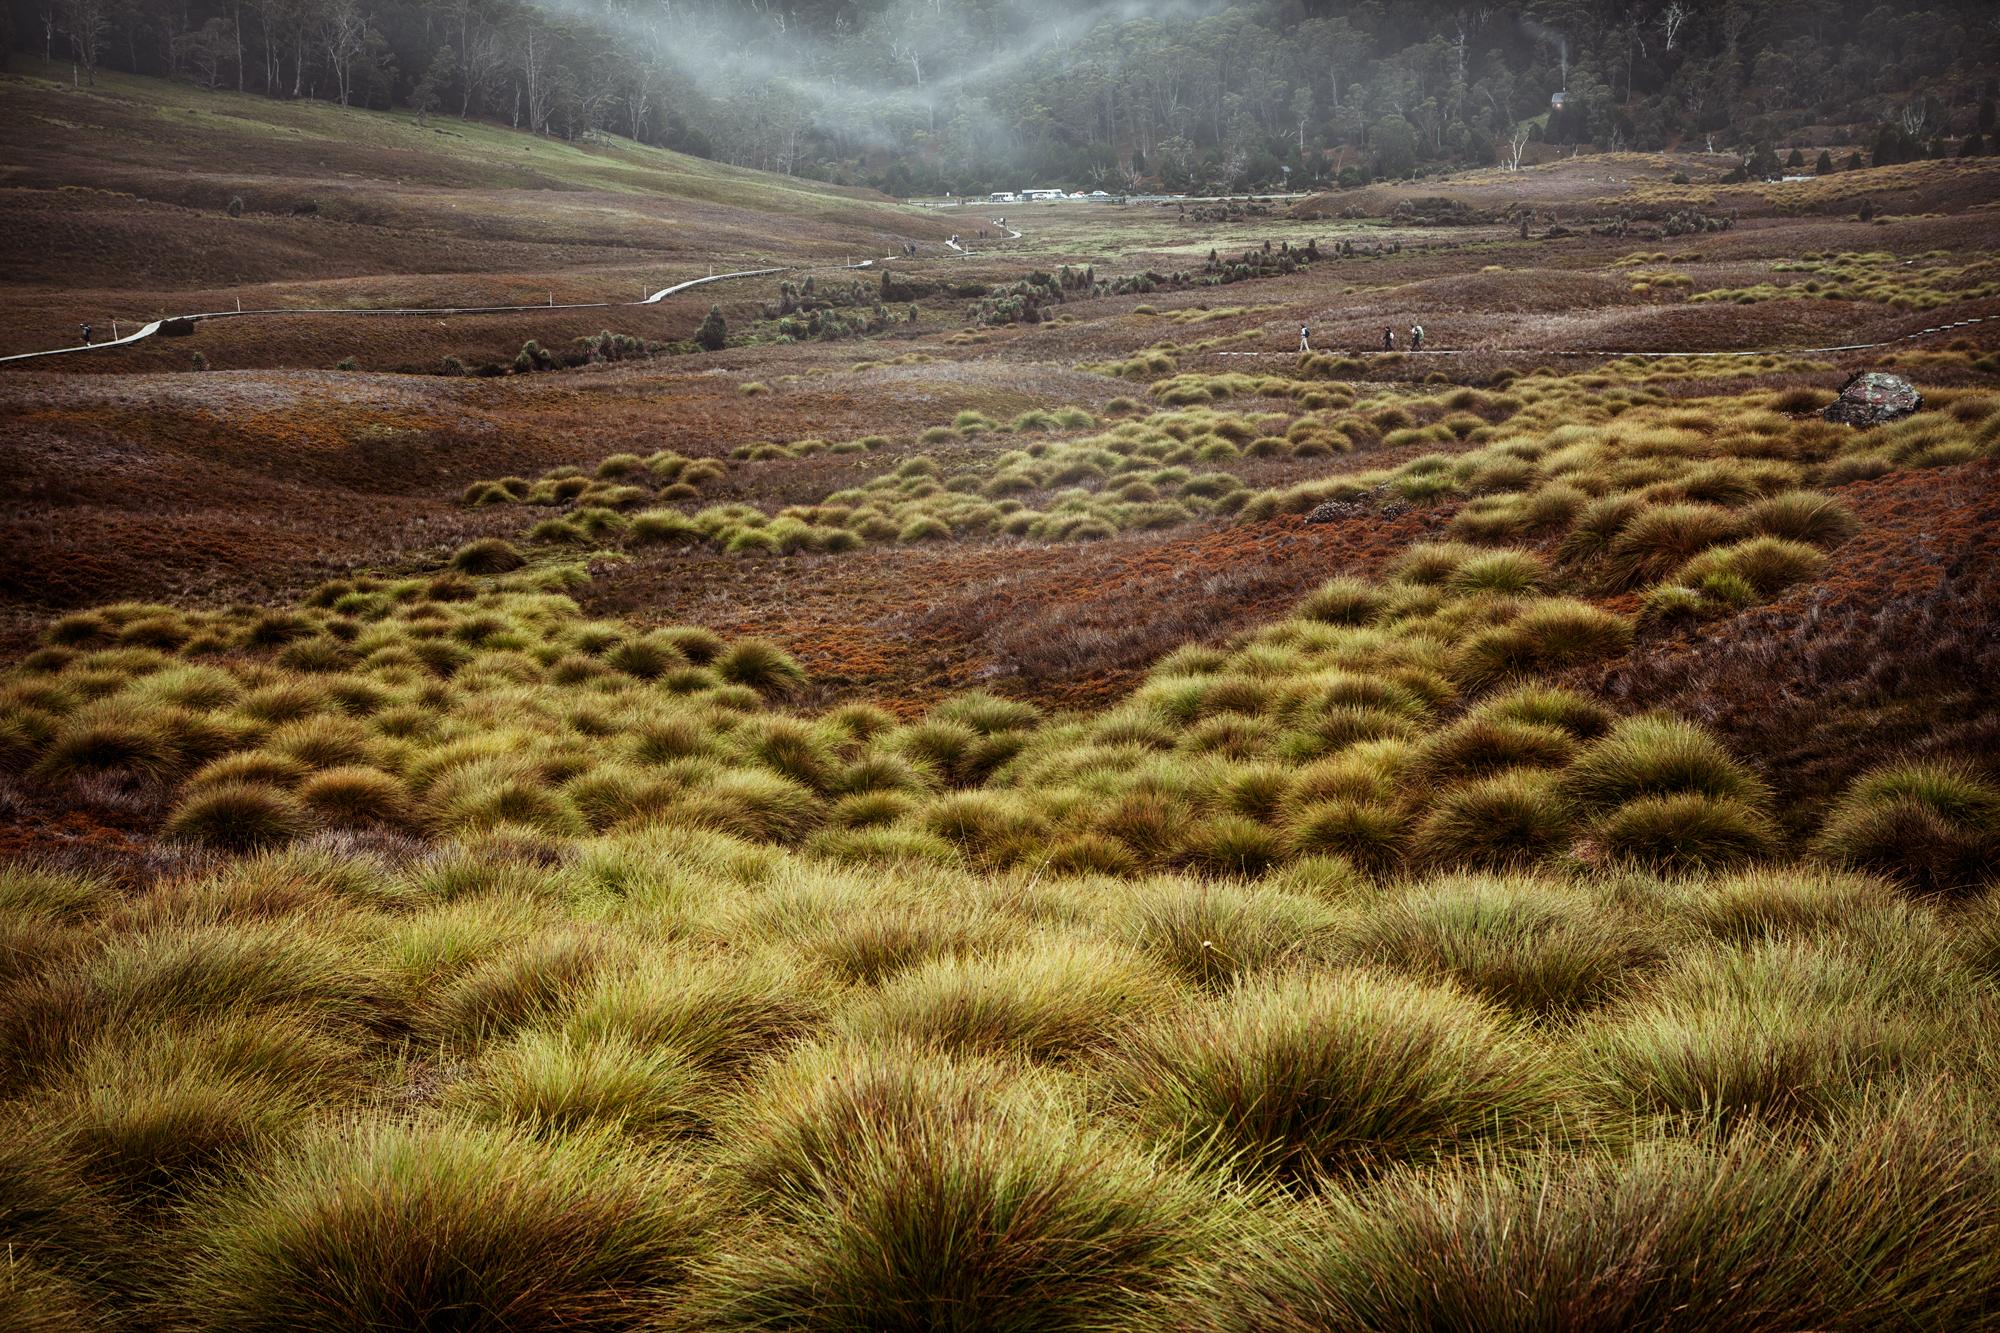 danny-Wootton-photographer-Tasmania-Cradle-Mountain_1.jpg